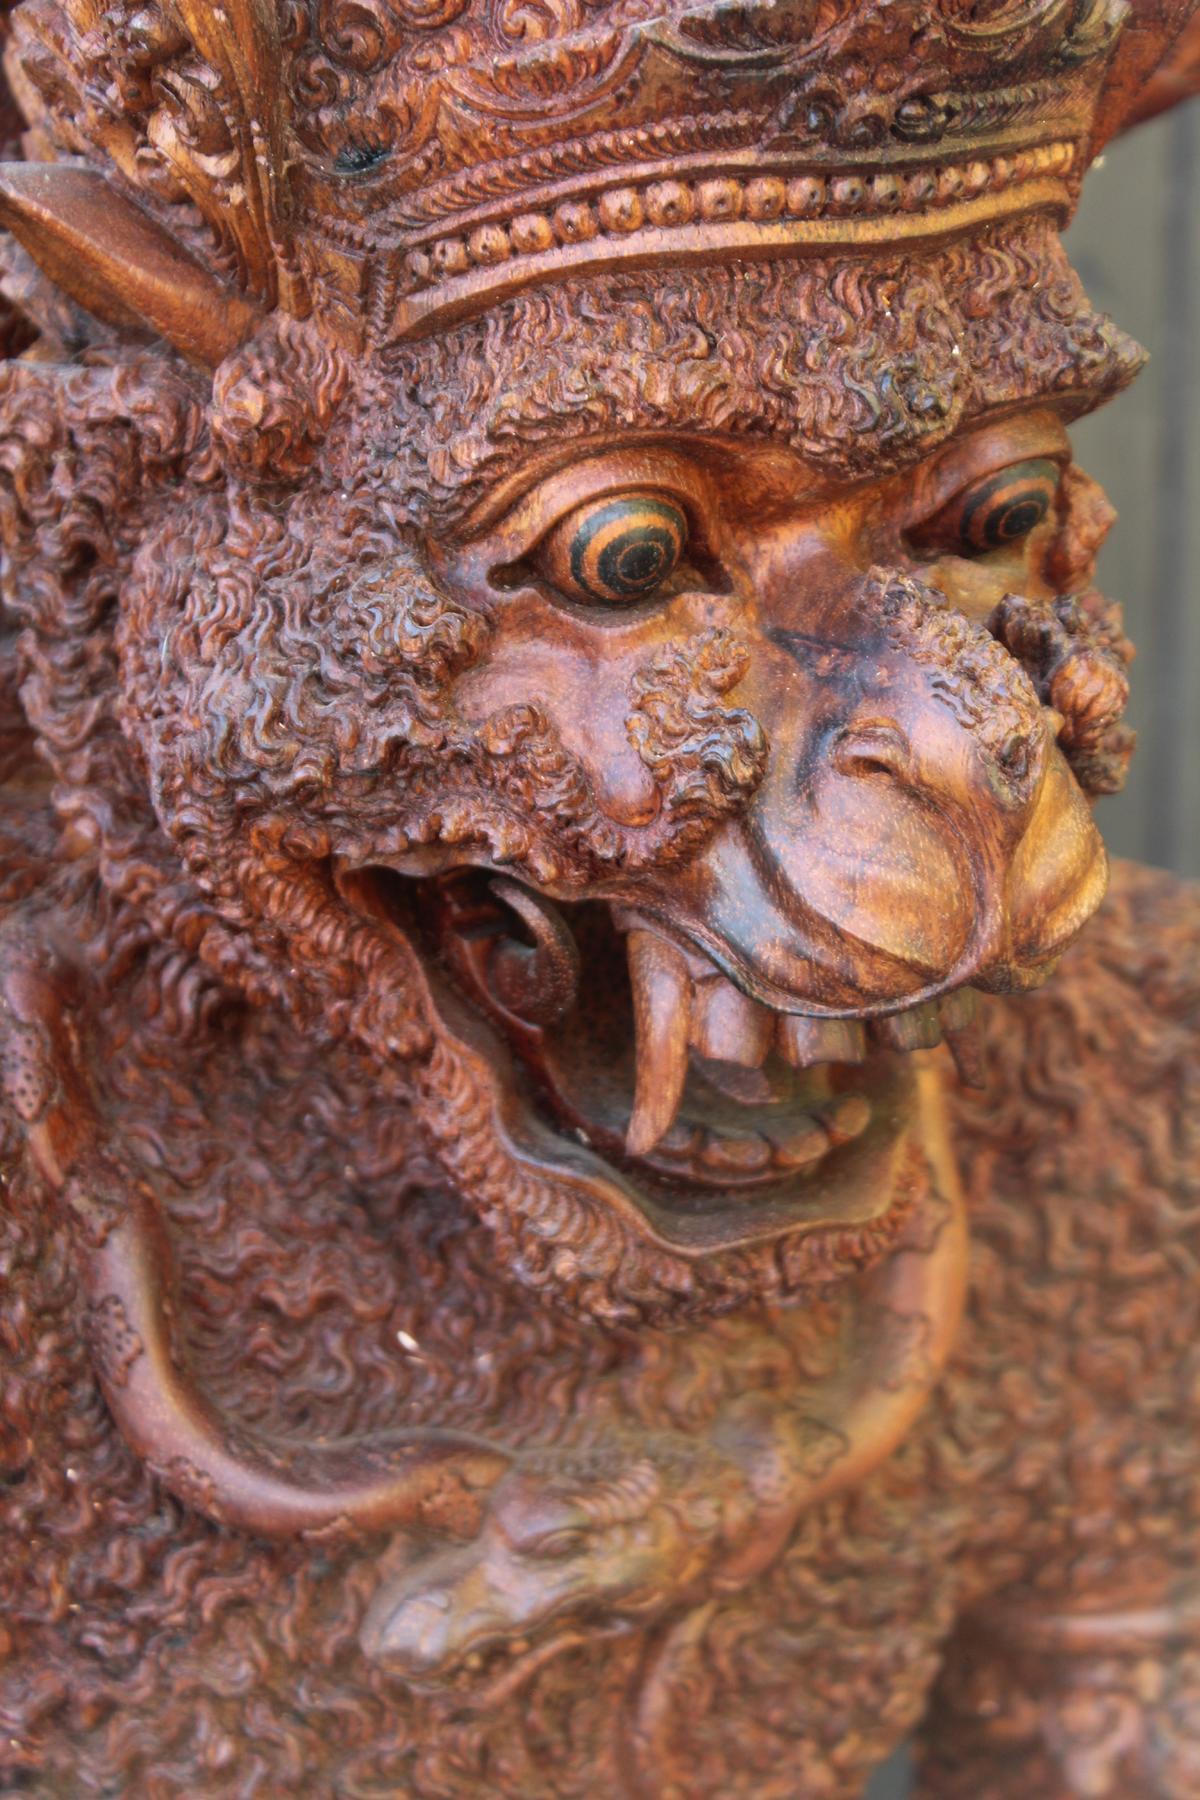 Große Holzskulptur, Indonesien / Bali, 2. Hälfte 20. Jahrhundert-5